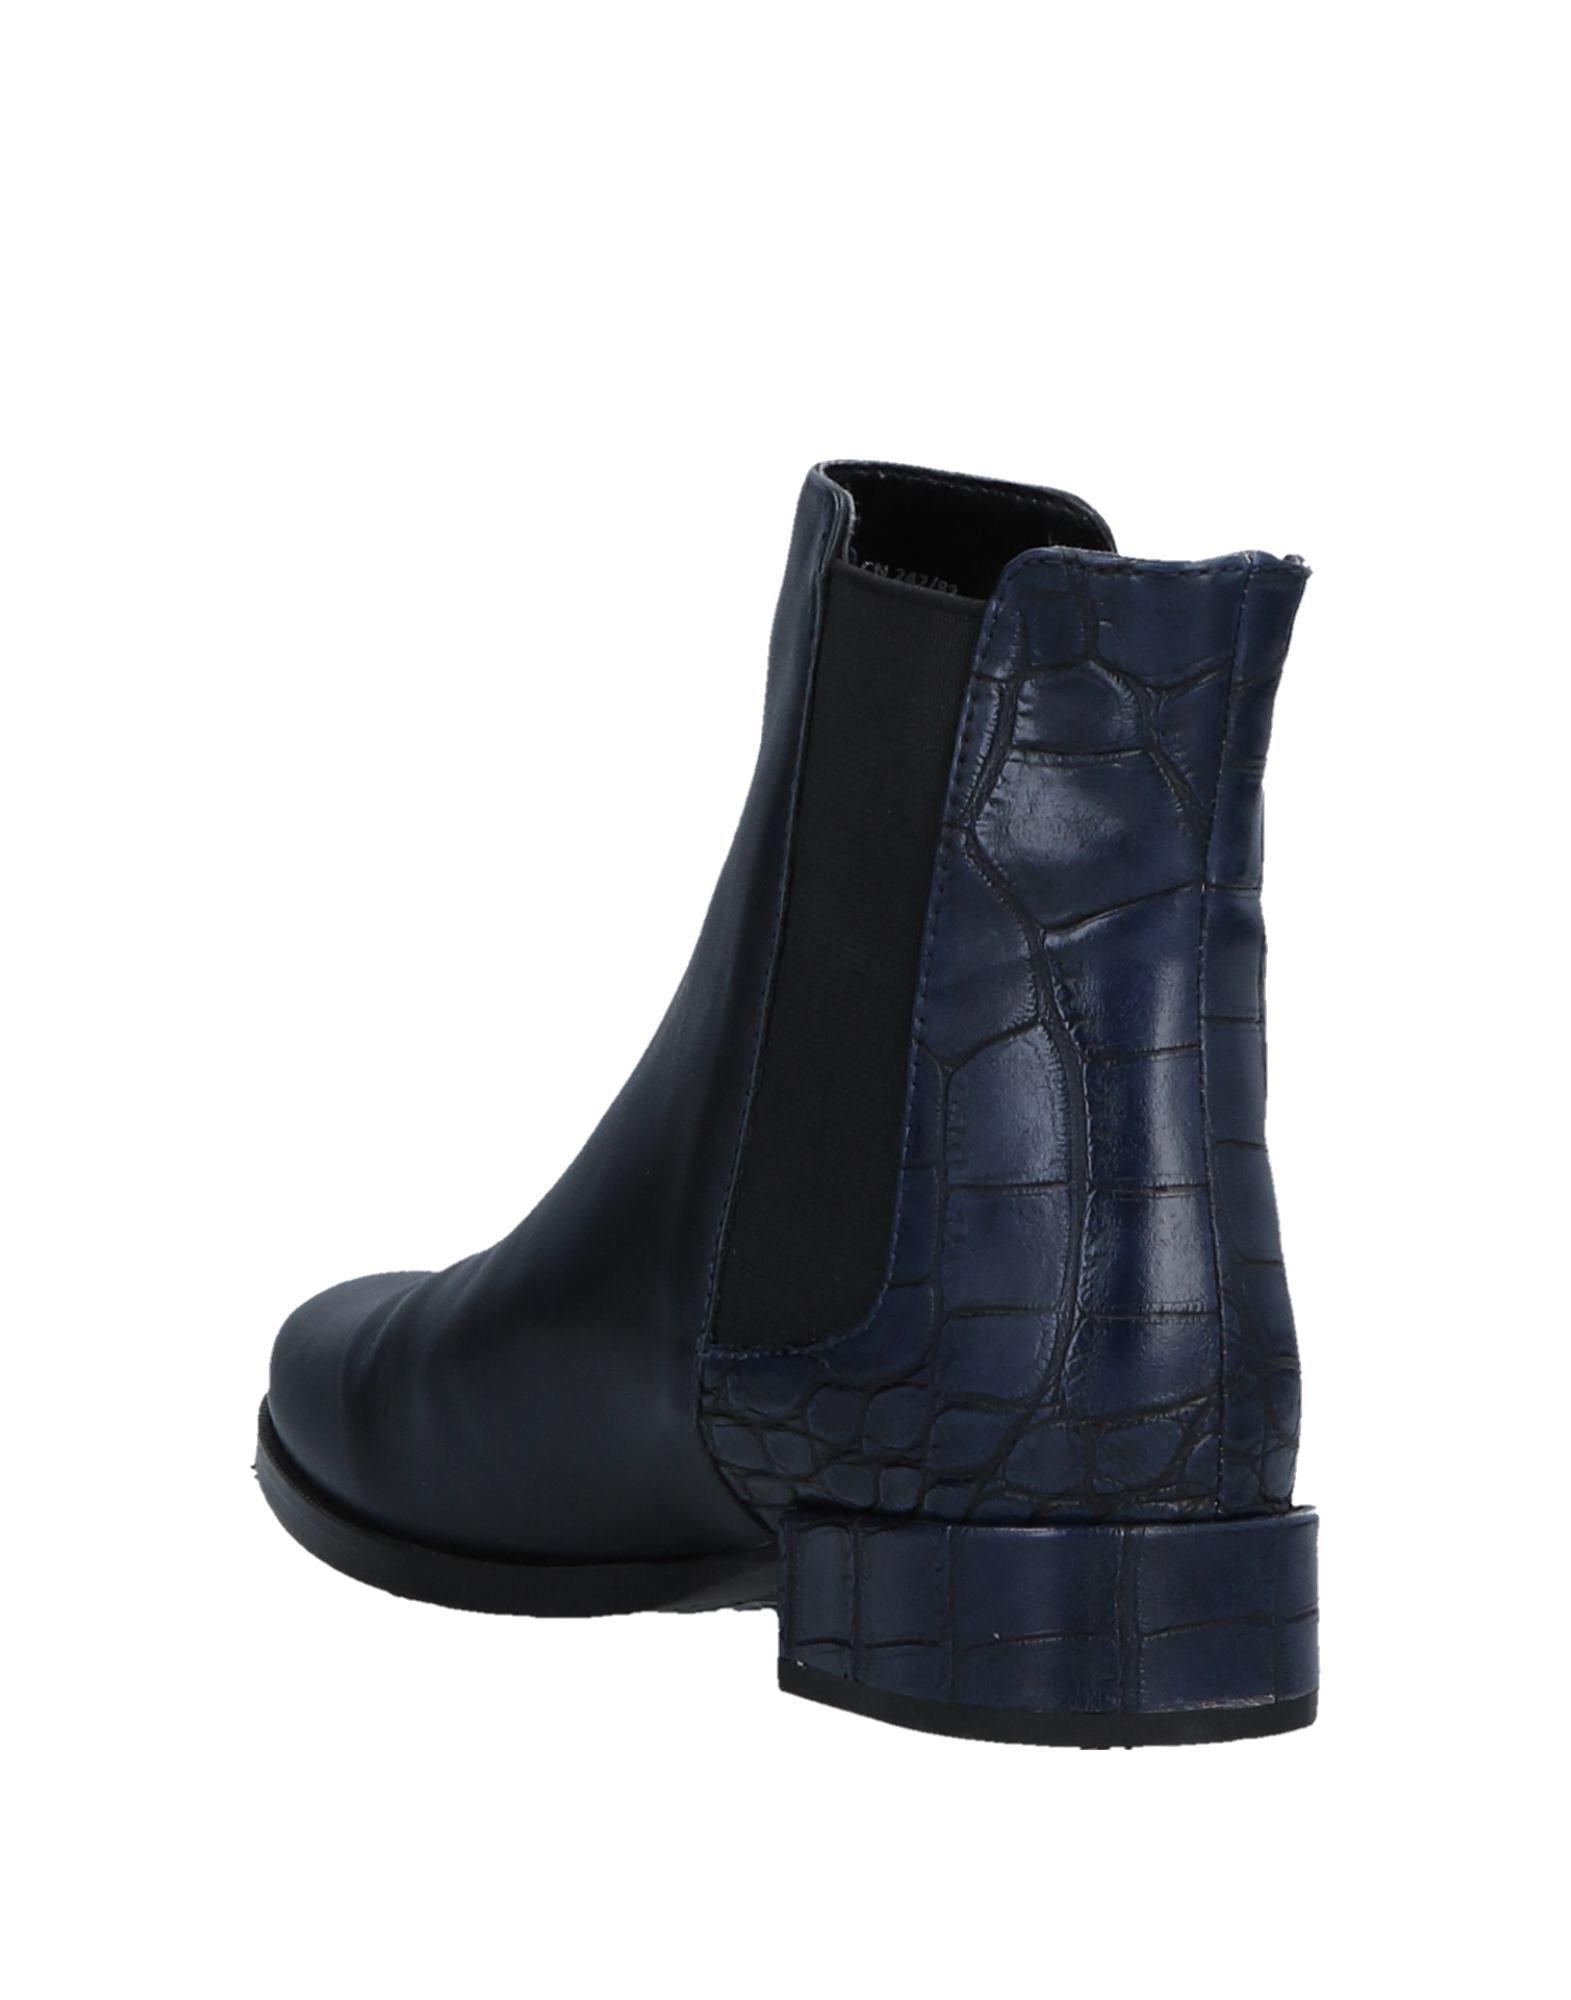 Armani  Jeans Chelsea Boots Damen  Armani 11531659PQGut aussehende strapazierfähige Schuhe c72d2f